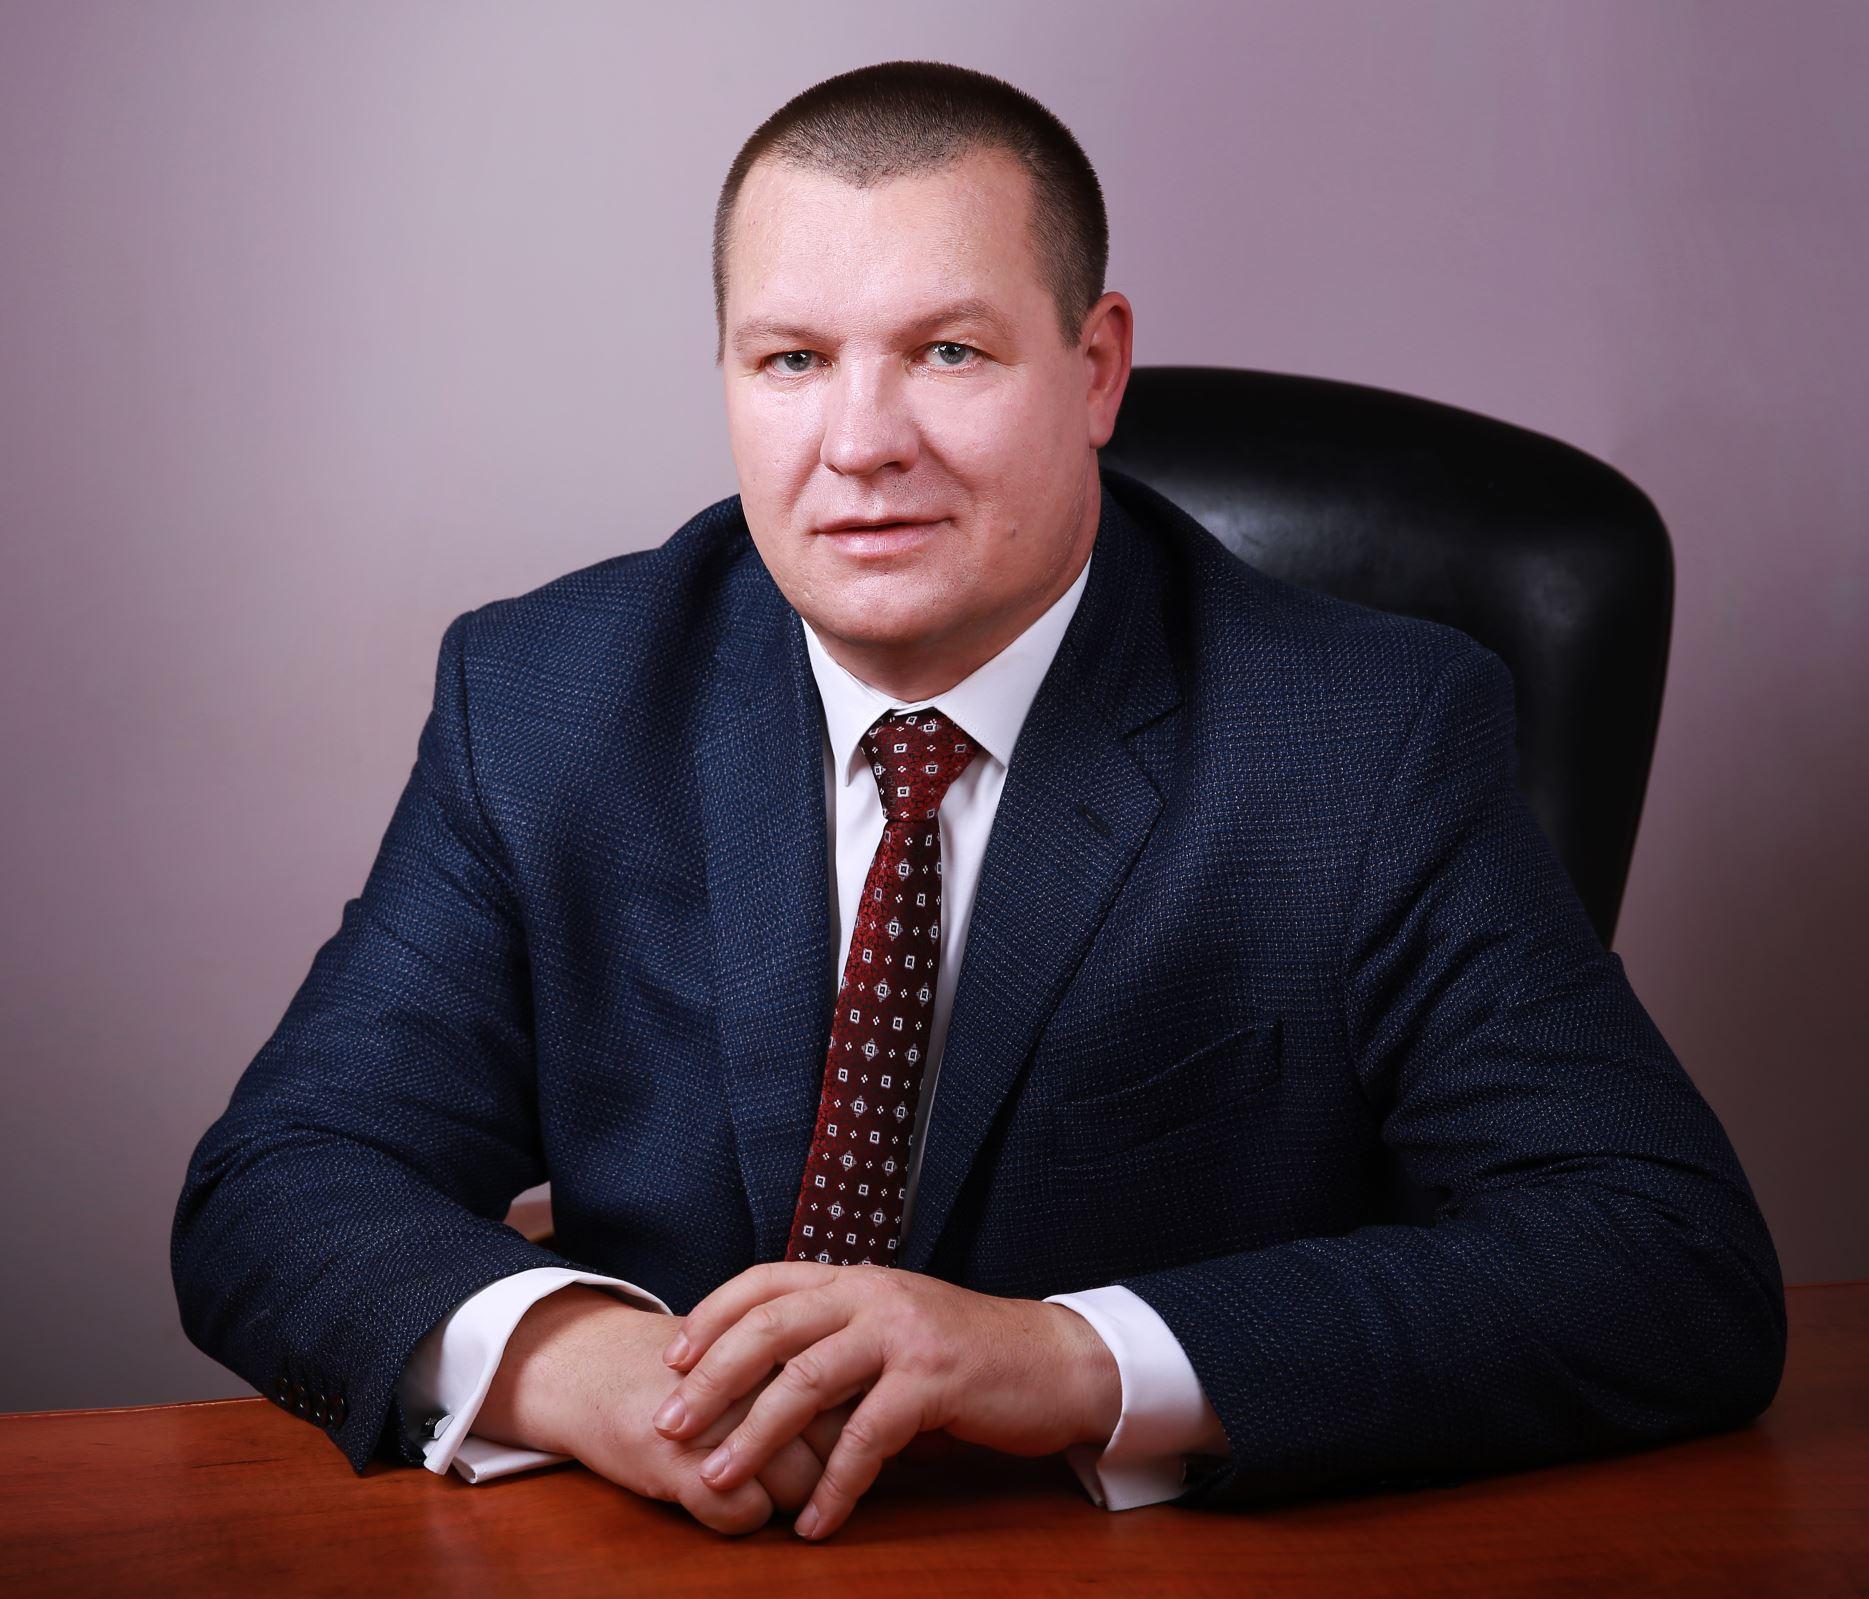 Хохлов Владимир Владимирович